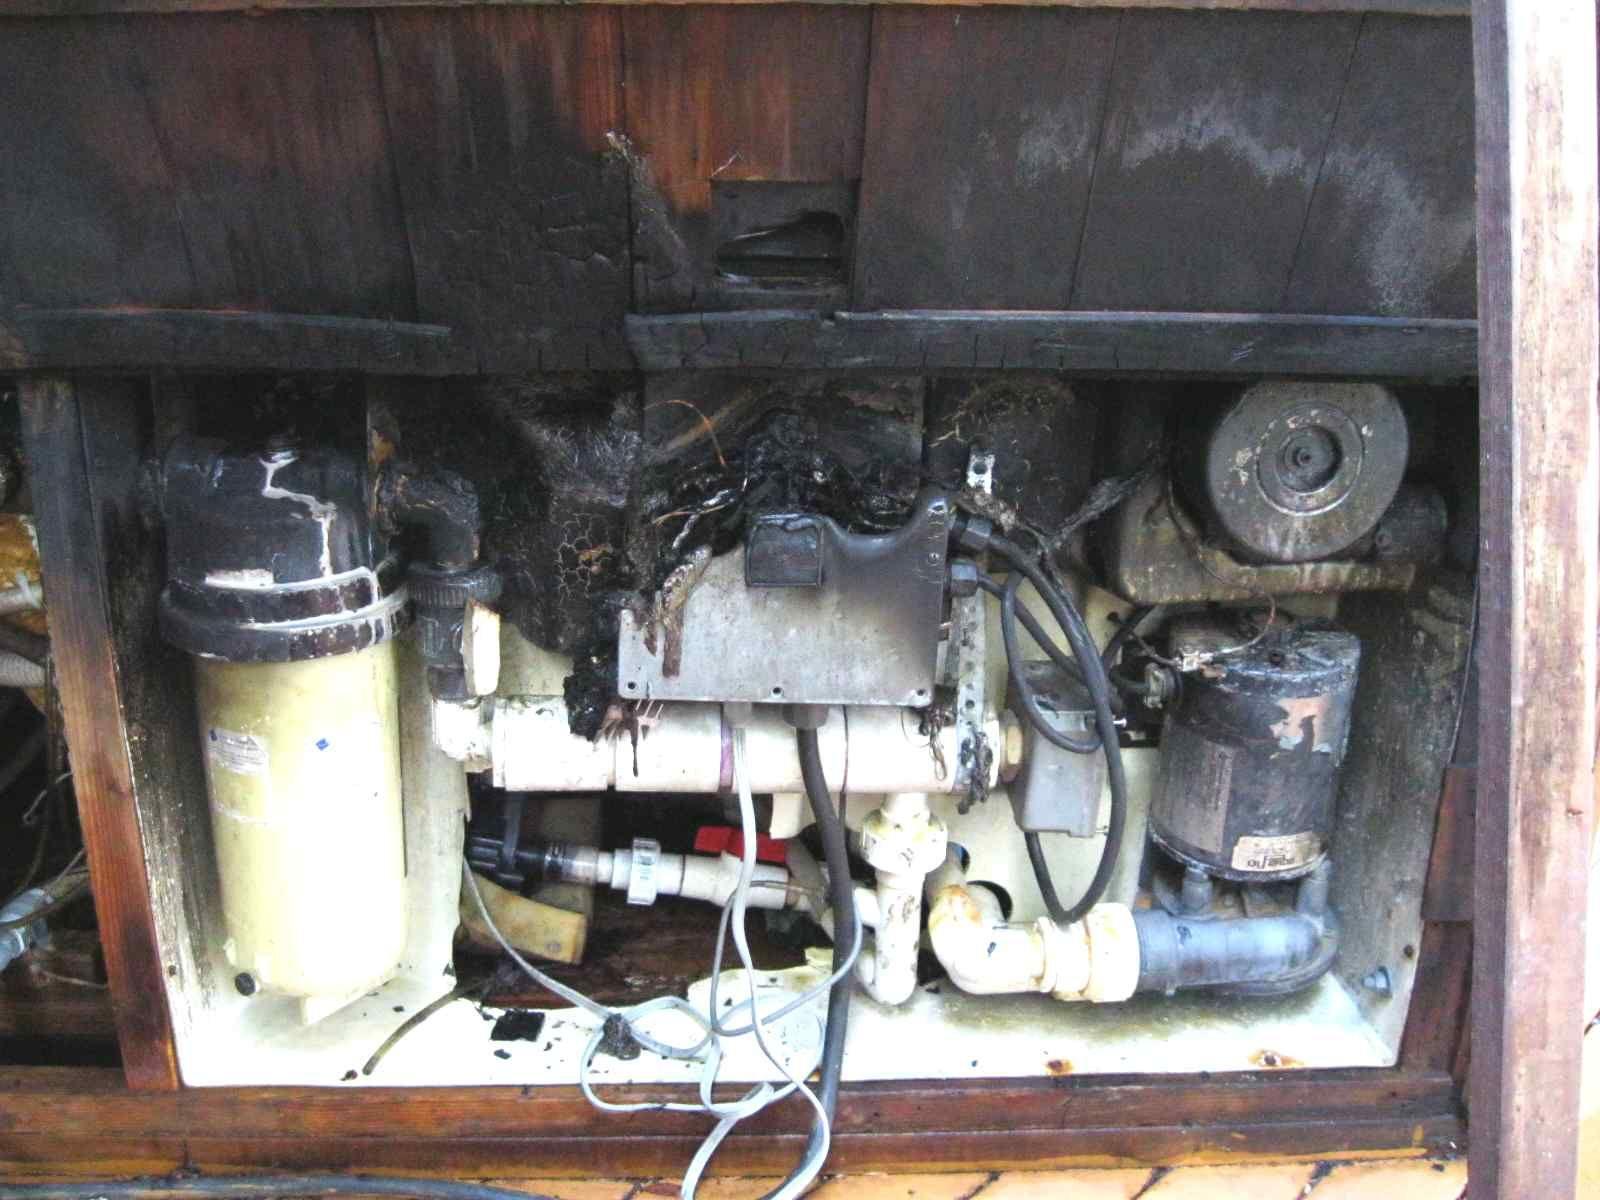 hight resolution of holy flaming ball of hot tub electrician colorado springs colorado springs electrician swartz electric blog mai bjorklund swartz electric